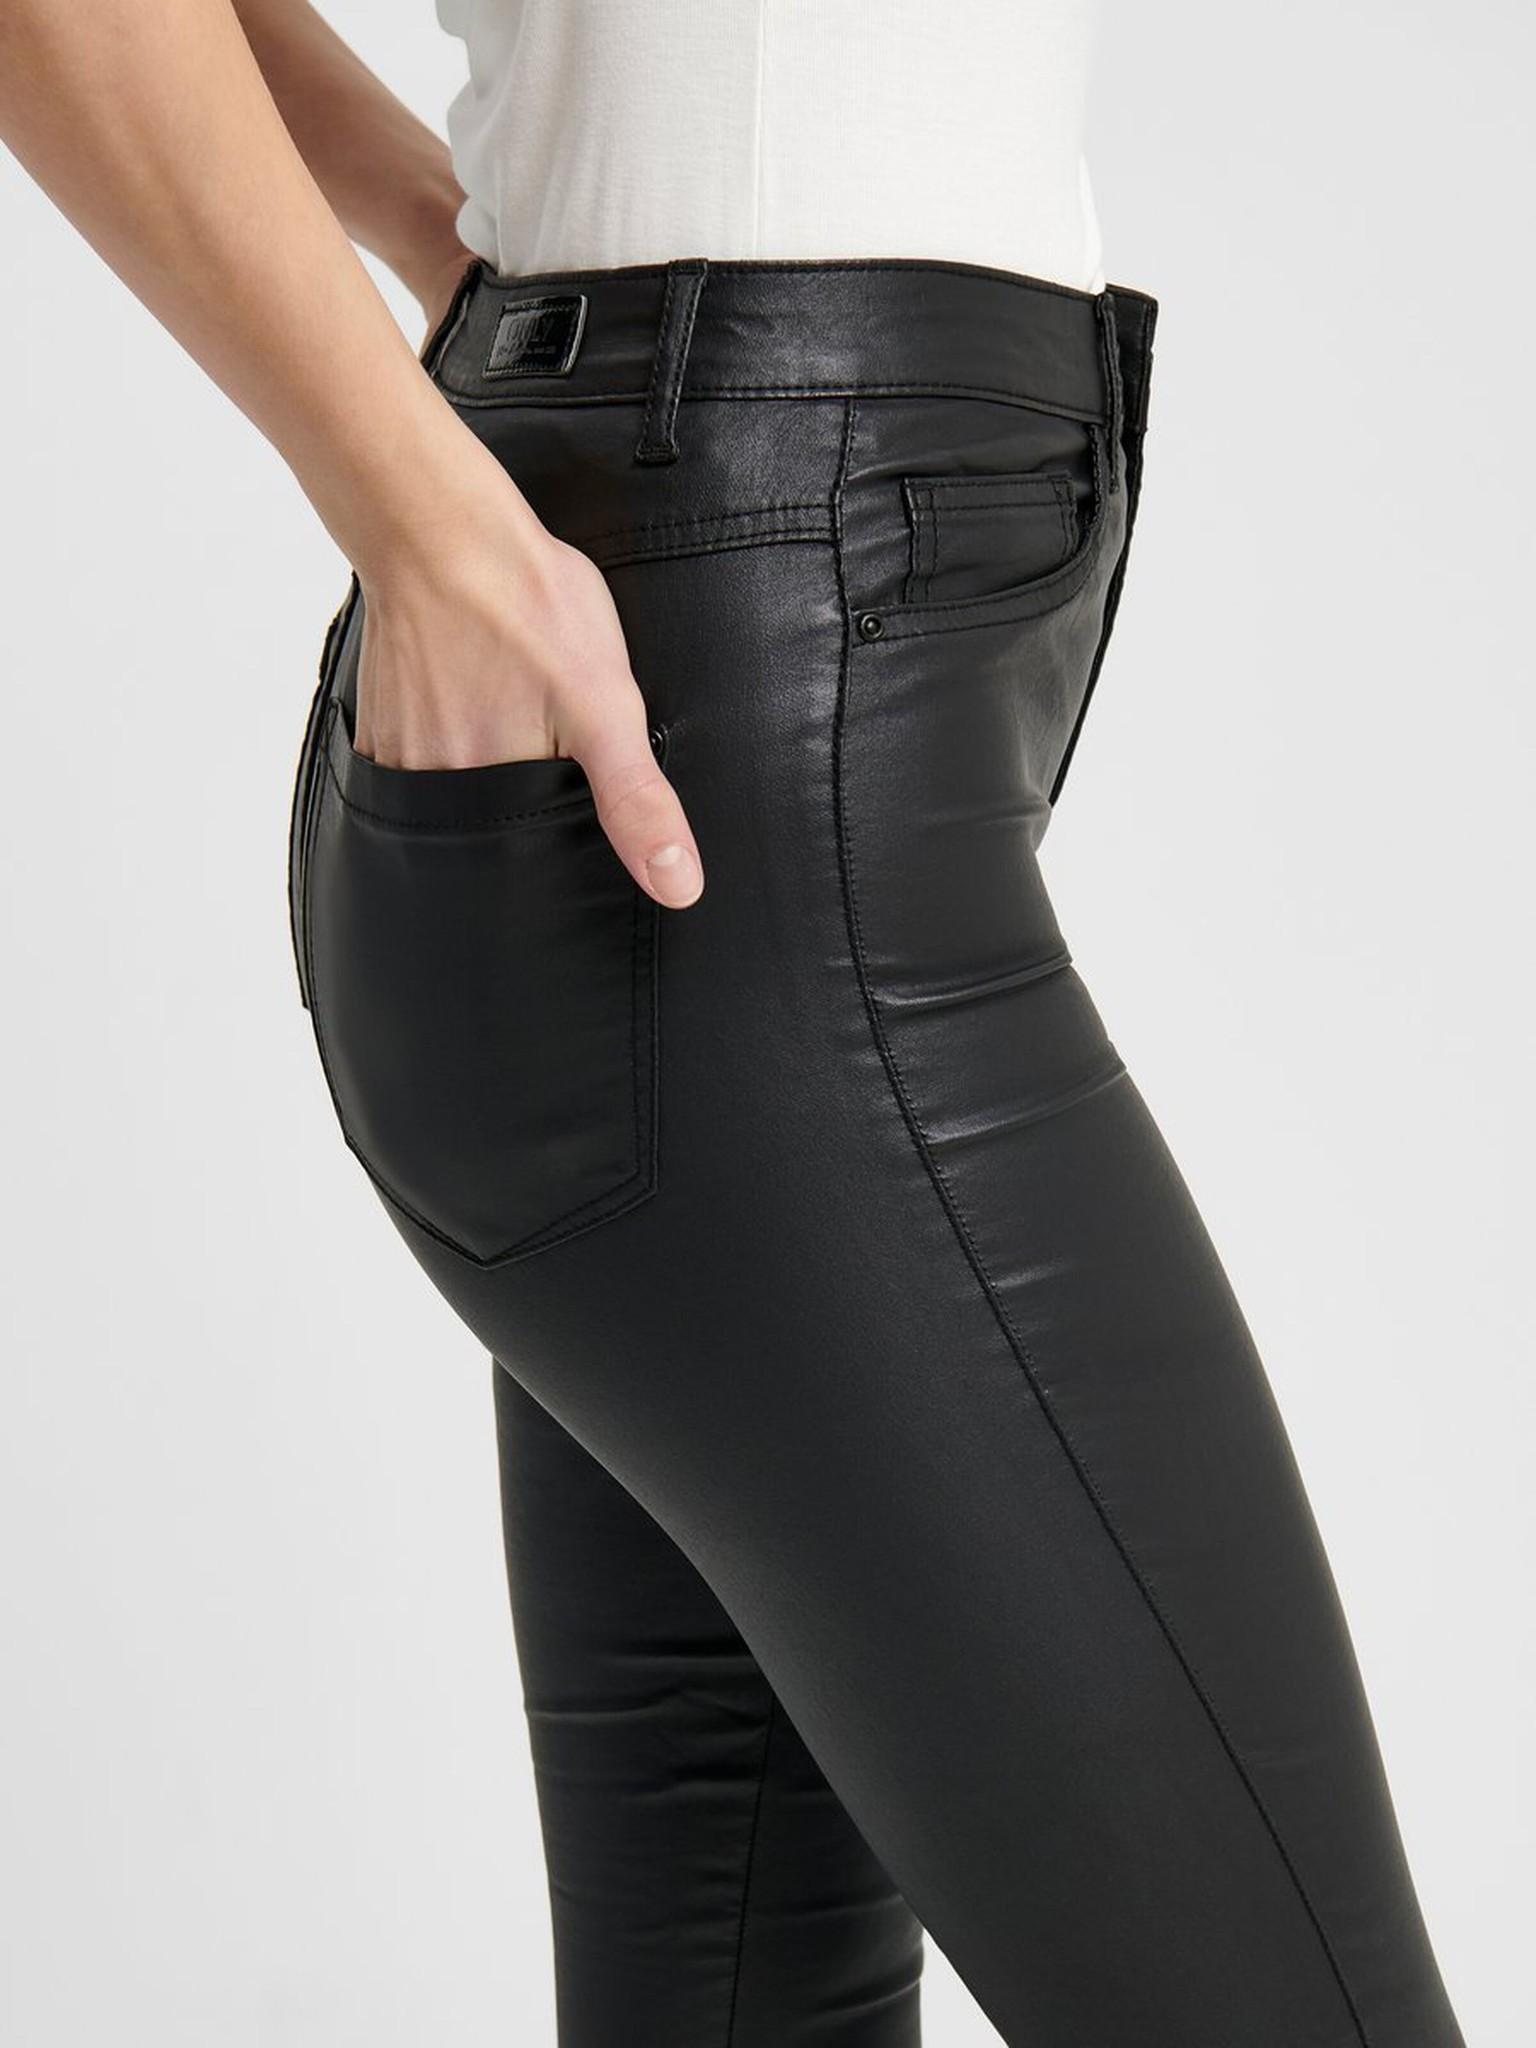 PEPITES pantalon royal noos-7